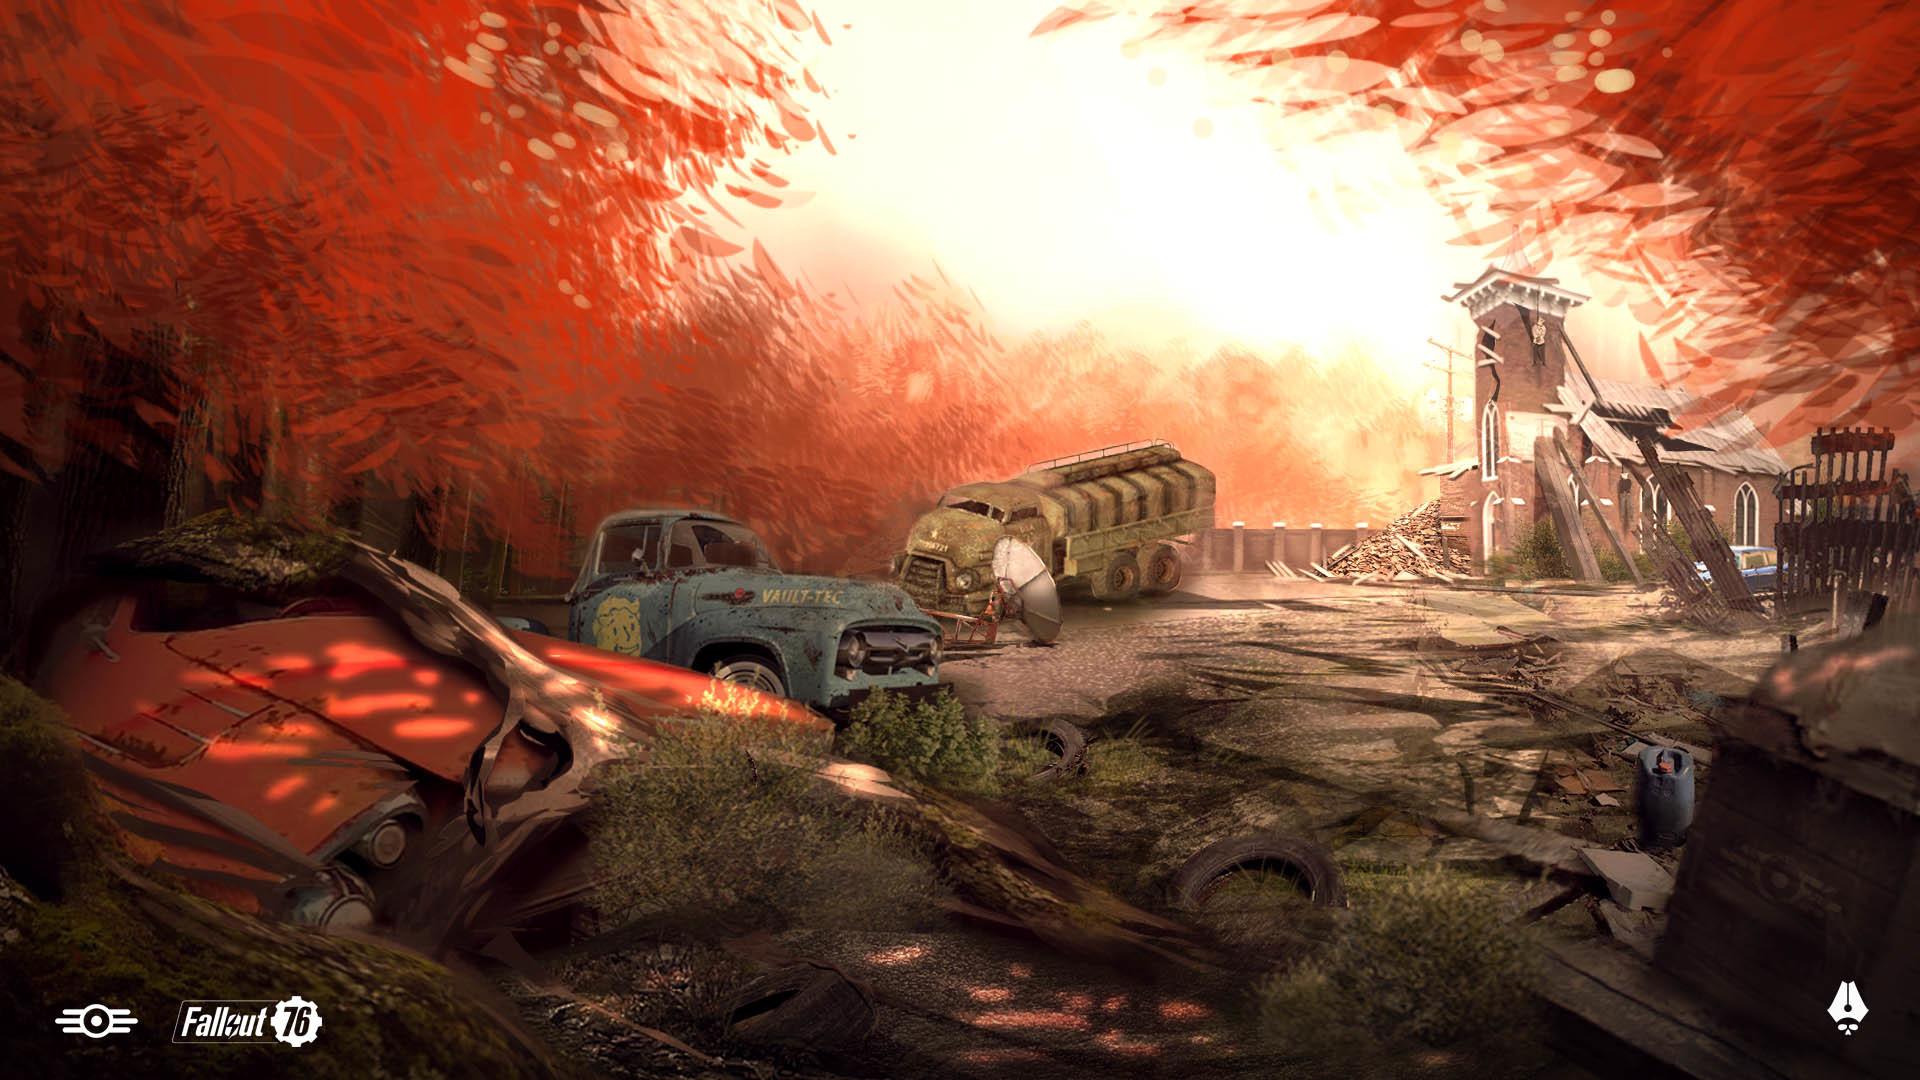 ArtStation - Fallout 76 fan art, Lorenzo Berzosa